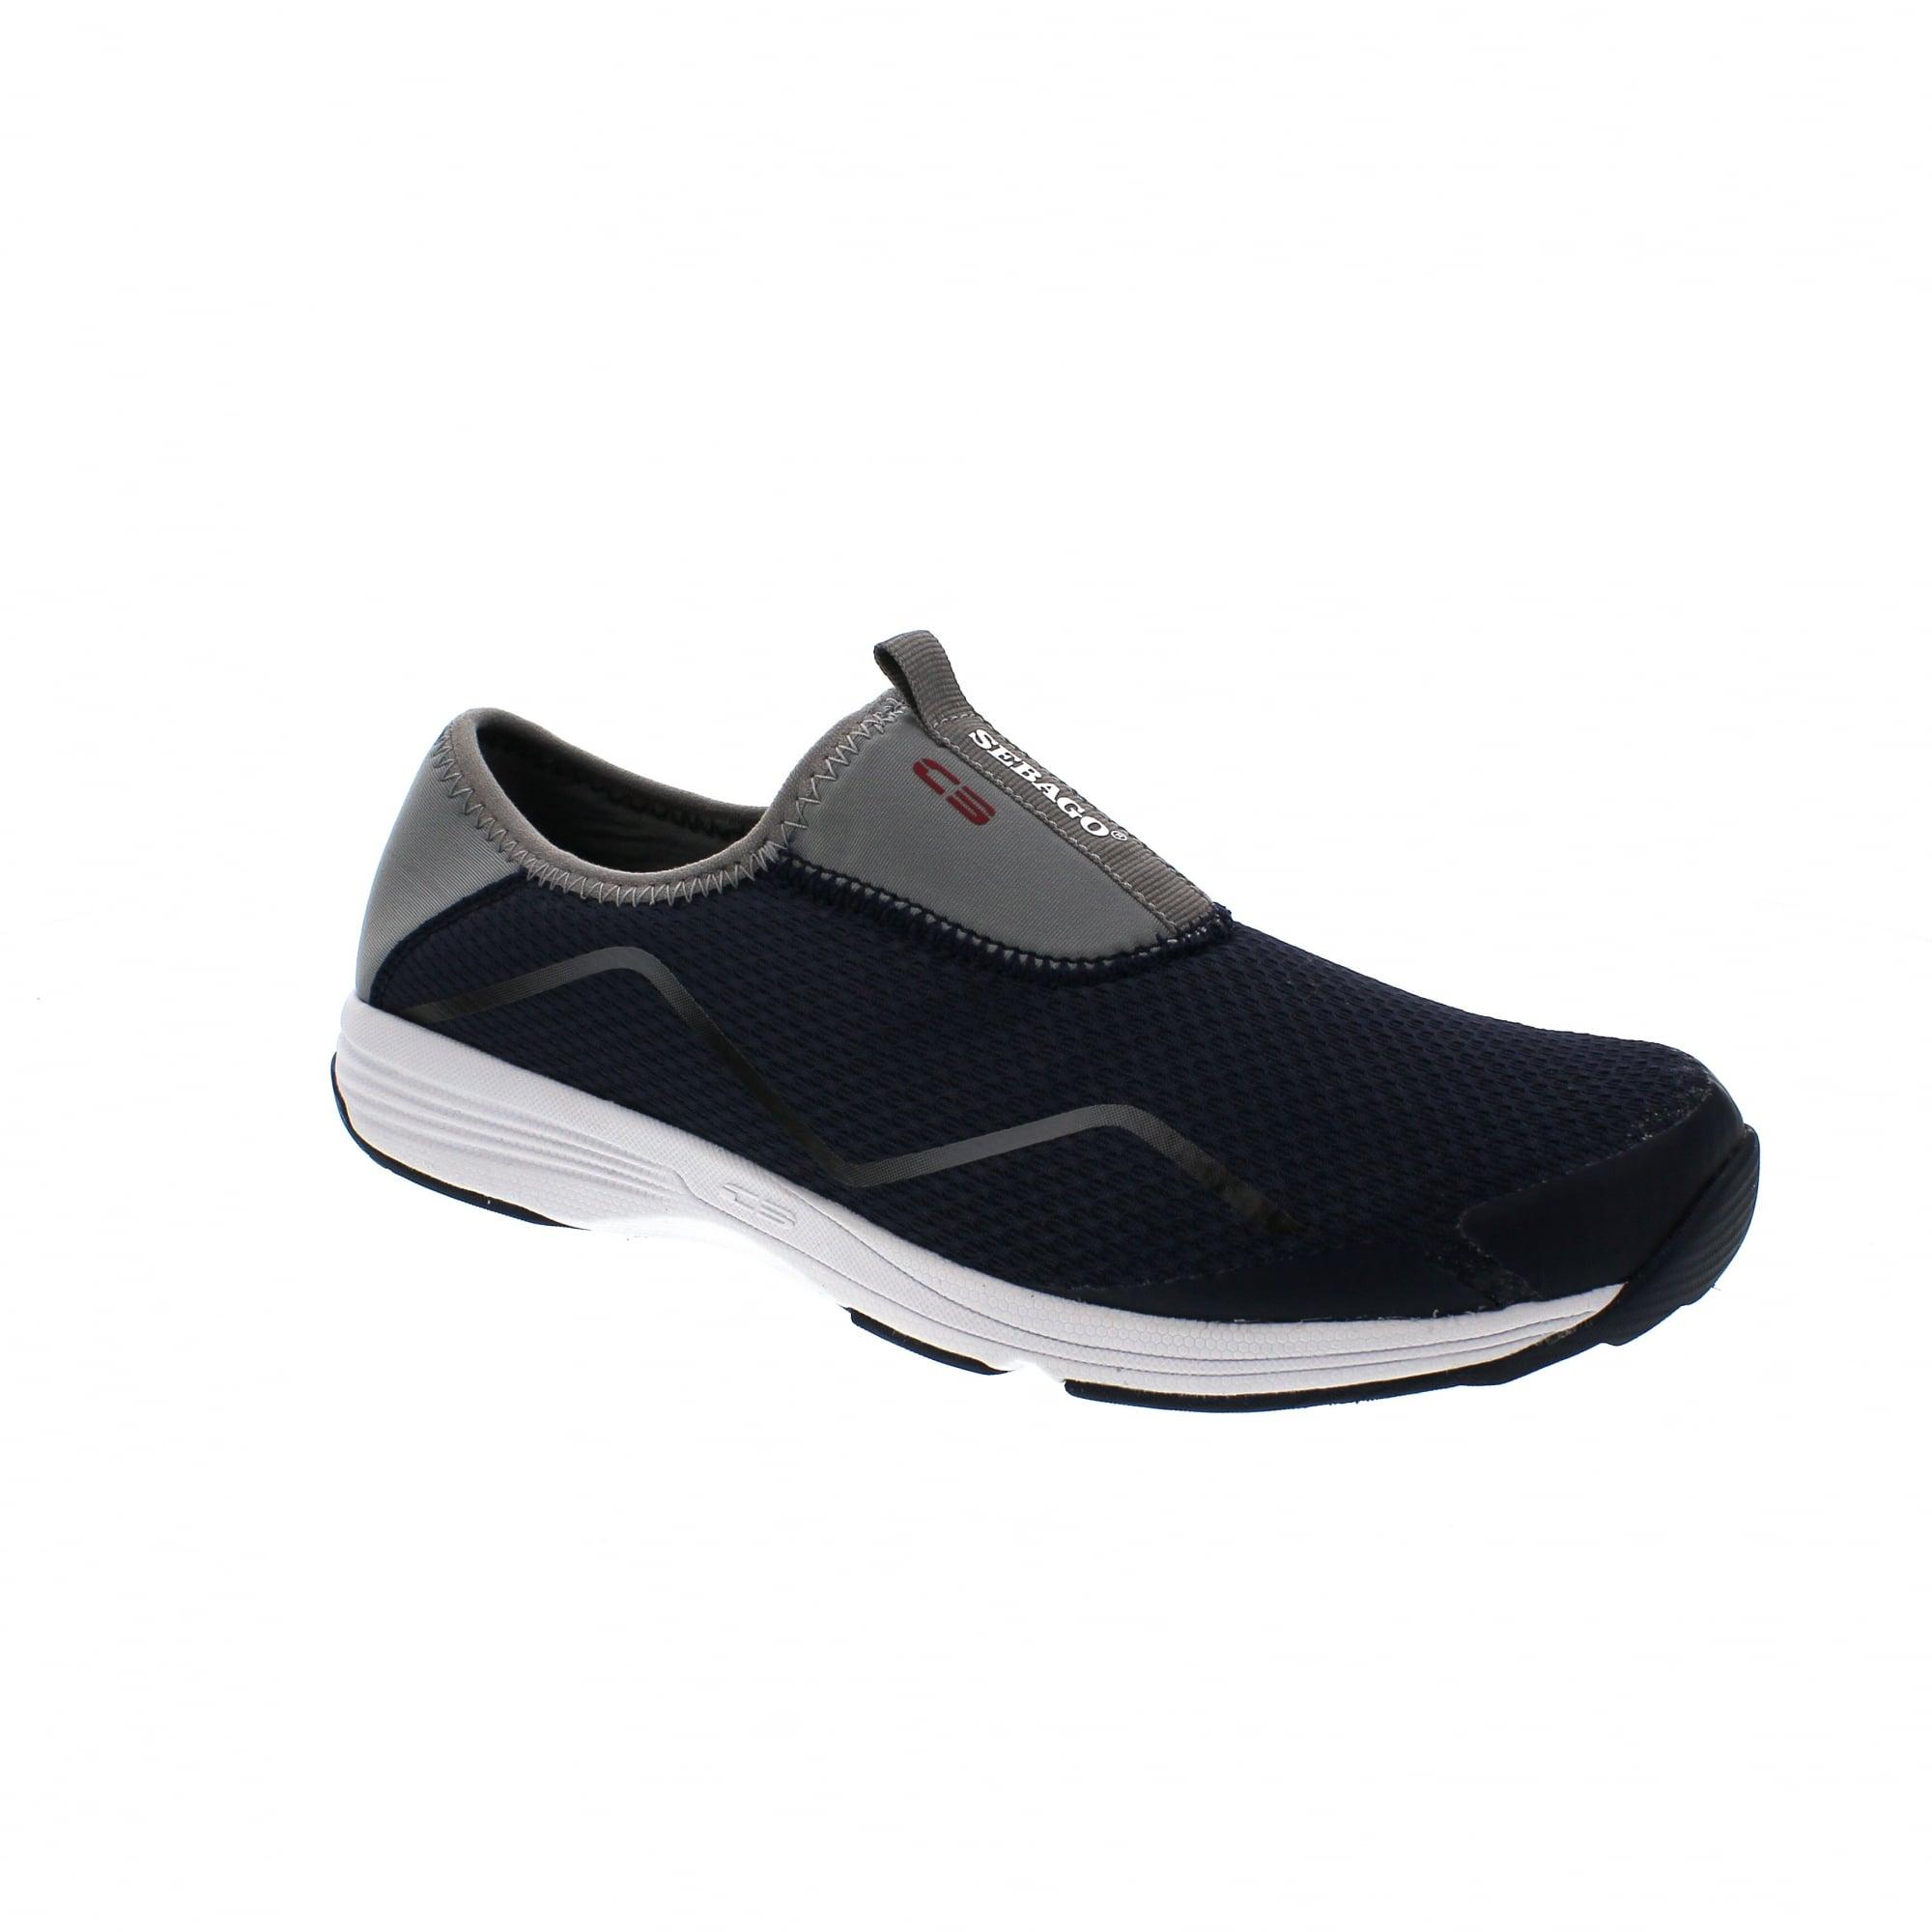 3a309dd241c2 Sebago Cyphon Sea Slip On 70004B0-908 Mens Slip On Shoes